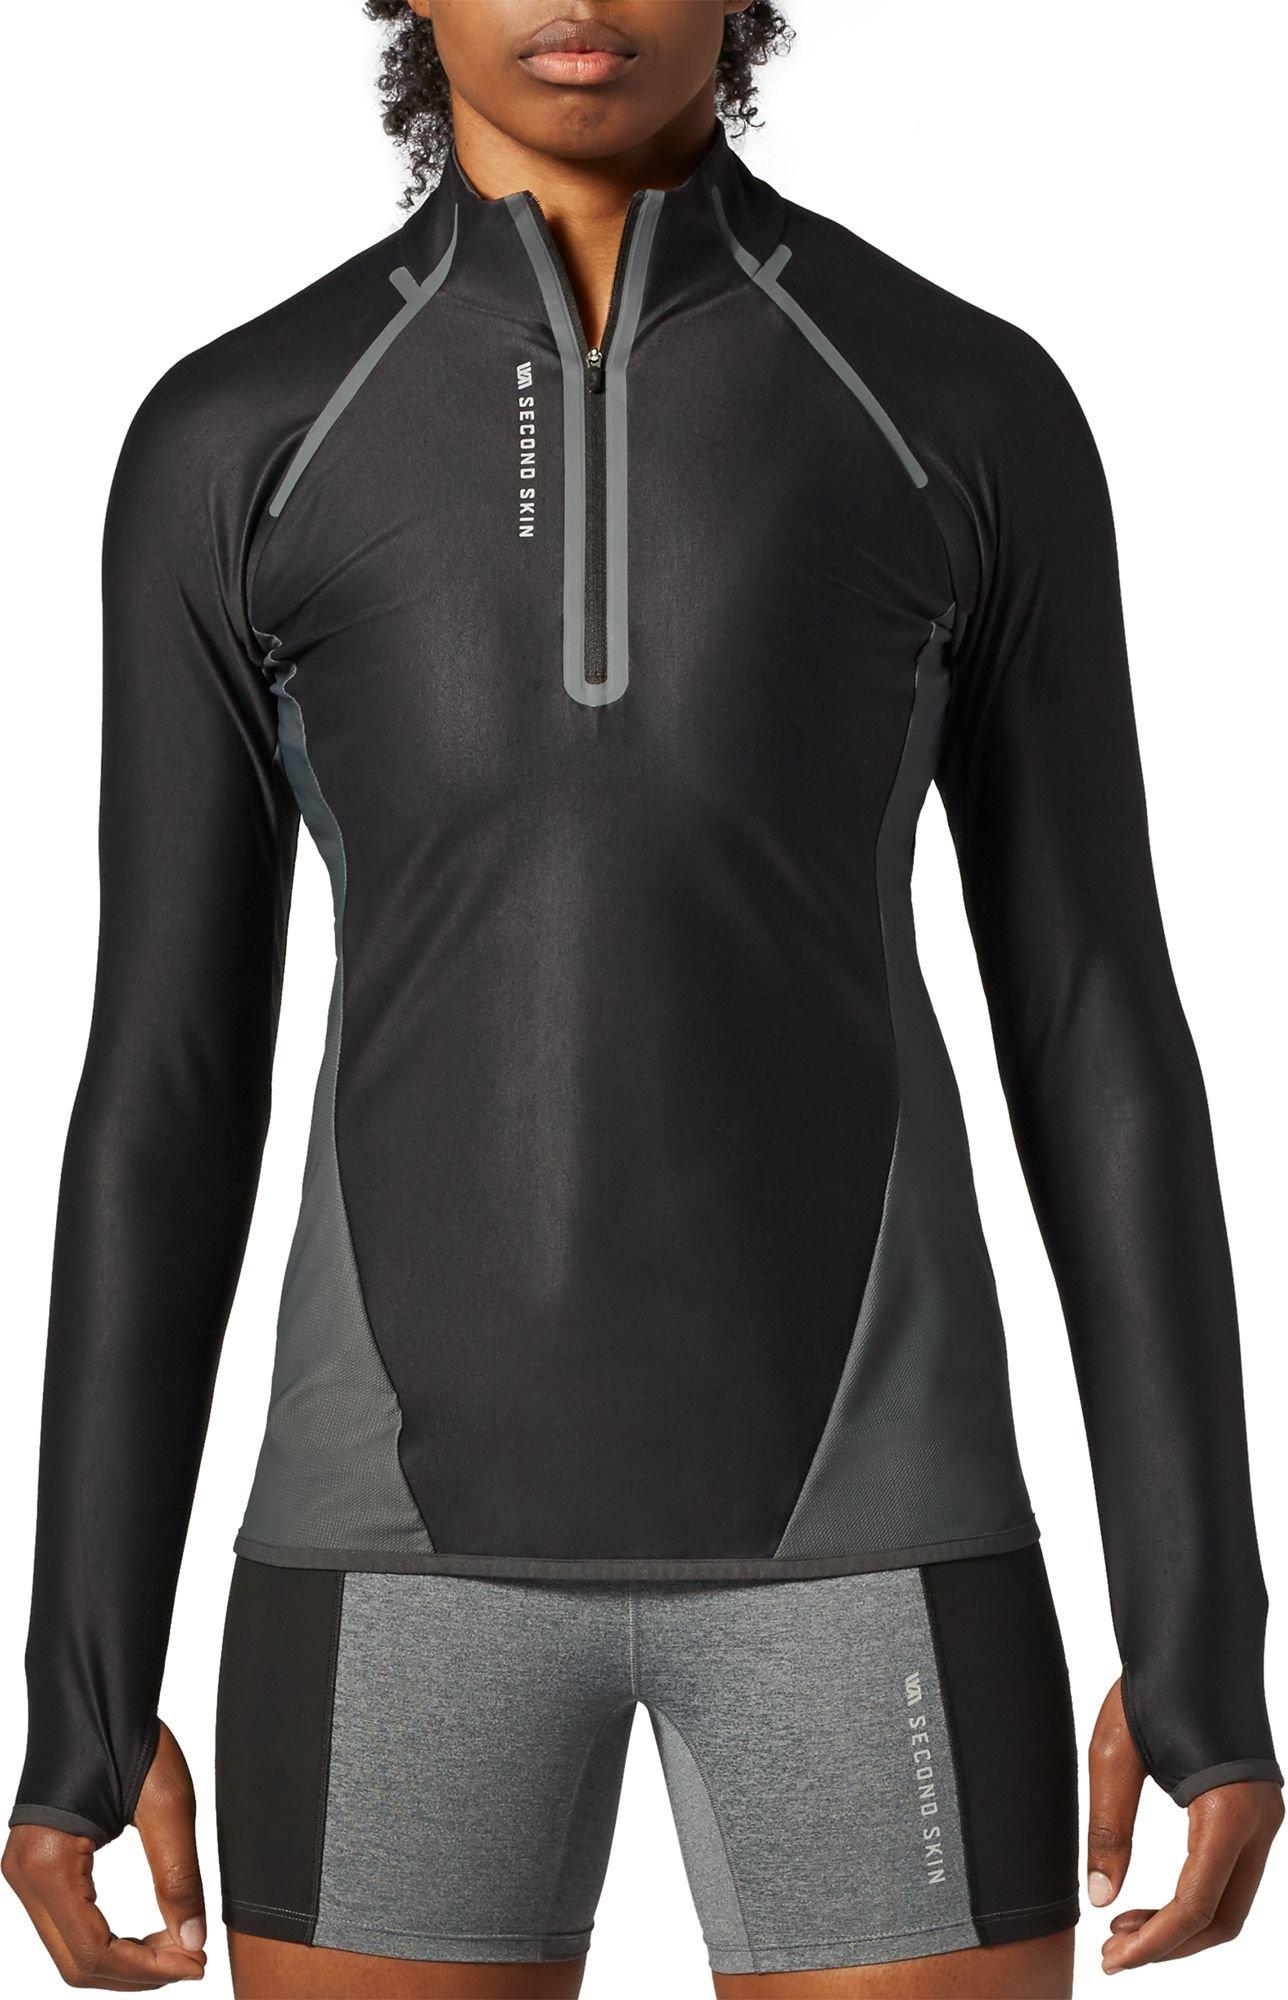 SECOND SKIN Women's 1/4 Zip Long Sleeve Training Top (Pure Black/Gravel, XS)